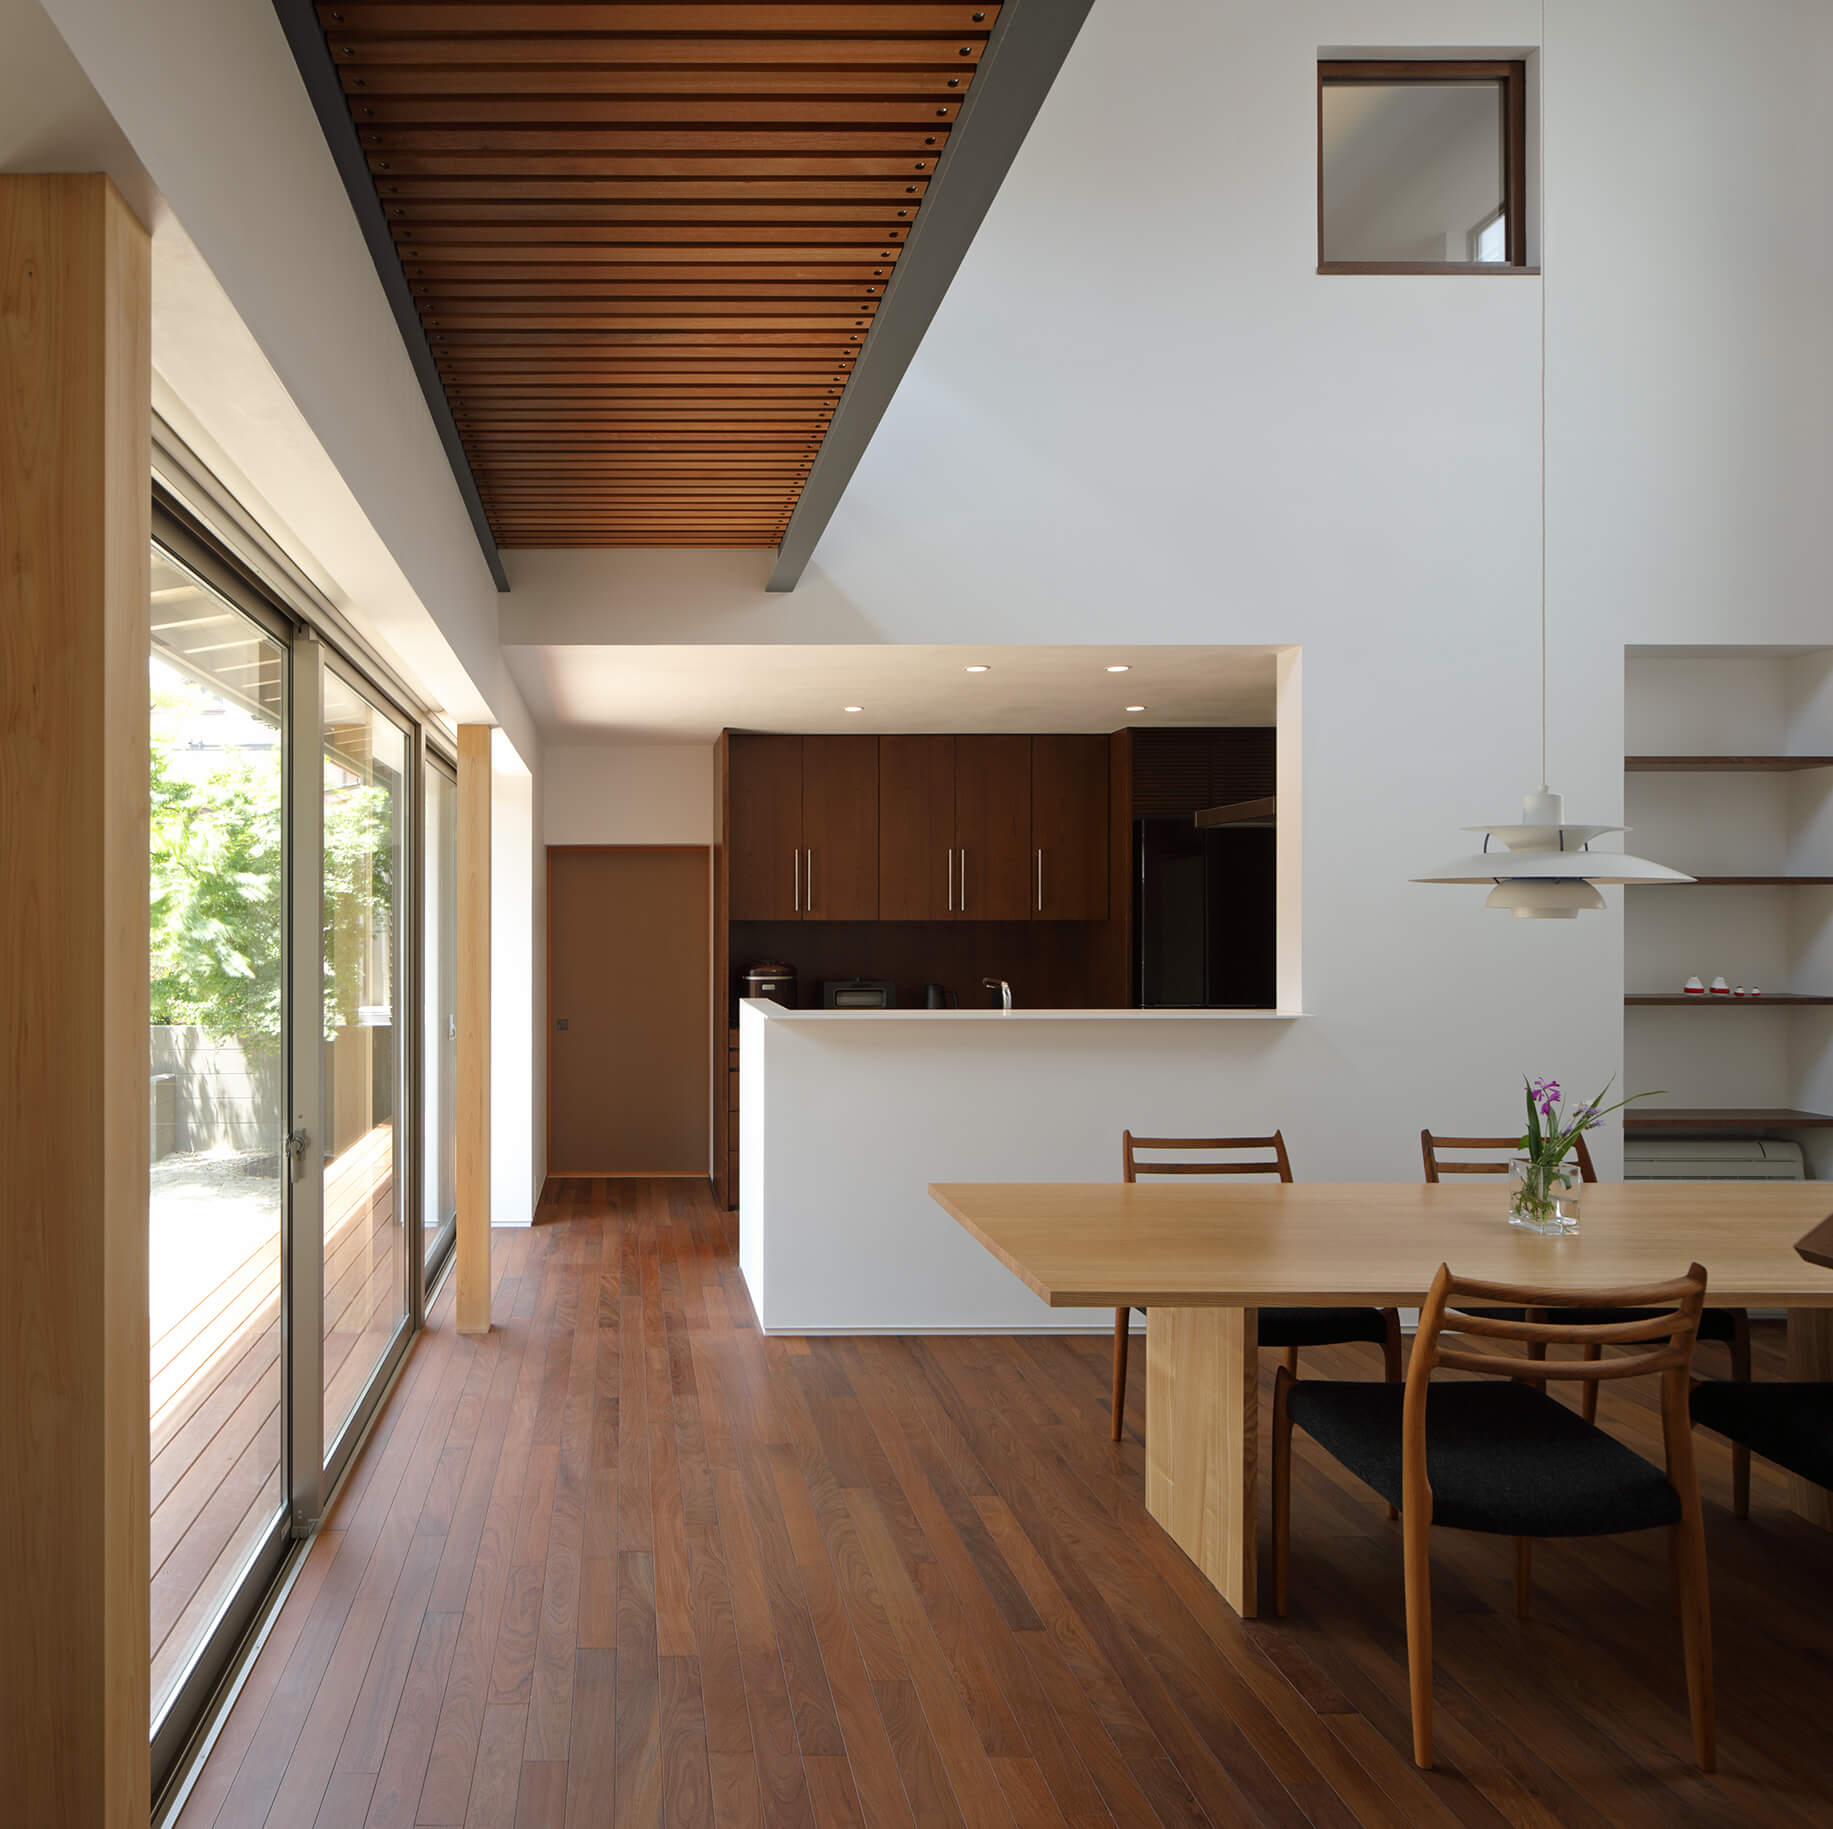 『福重の家』-福岡県福岡市-建築写真・竣工写真・インテリア写真3